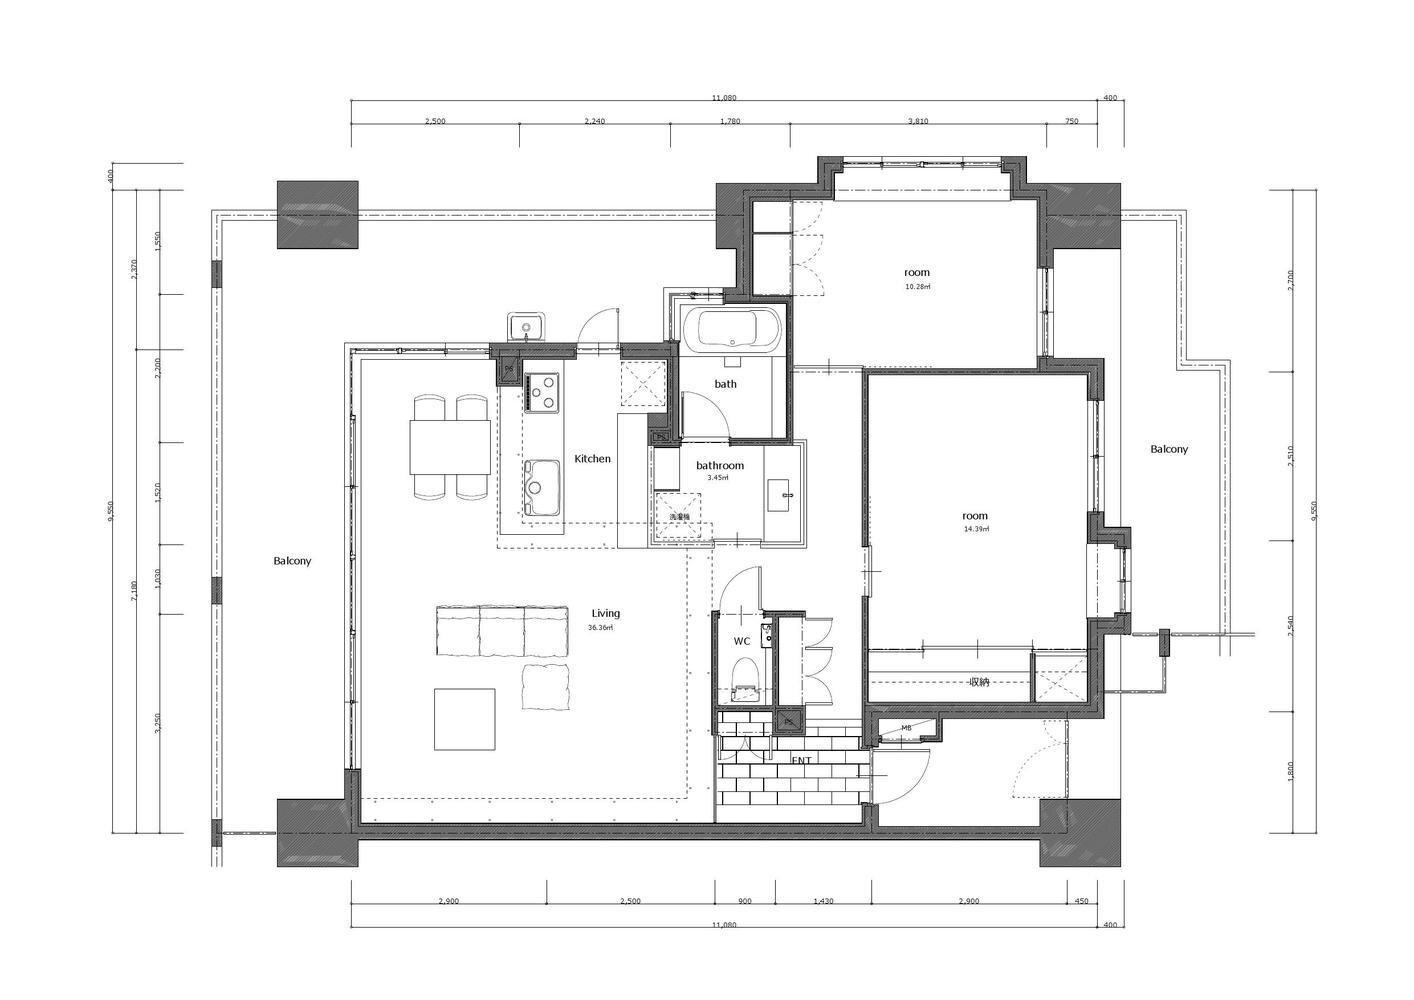 Nionohama Apartment House Renovation - ALTS Design Office - Japan - Floor Plan - Humble Homes